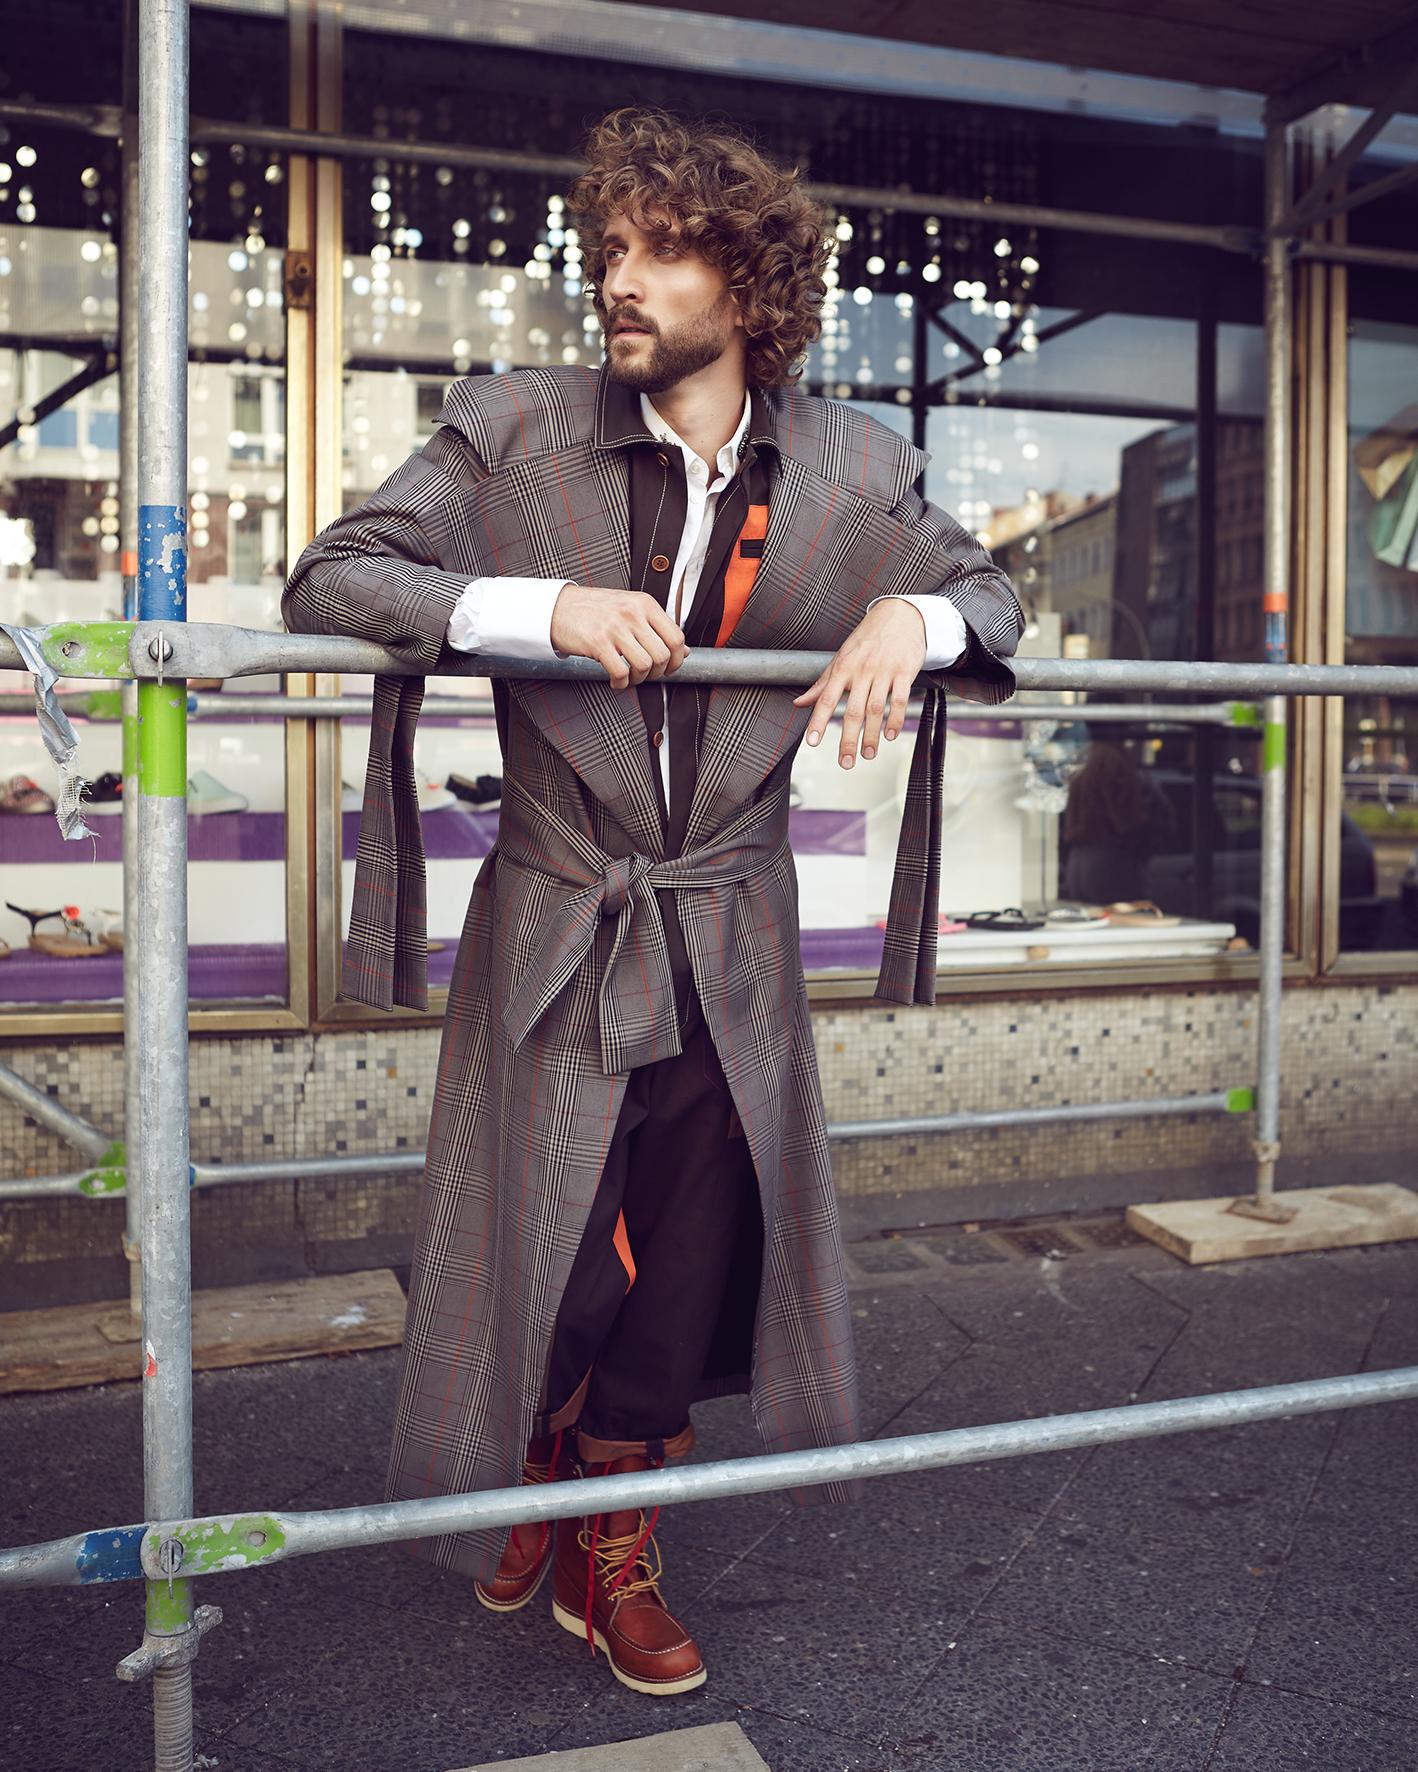 Male fashion editorial with model Erik Reisinger by Heidi Rondak for Vangardist